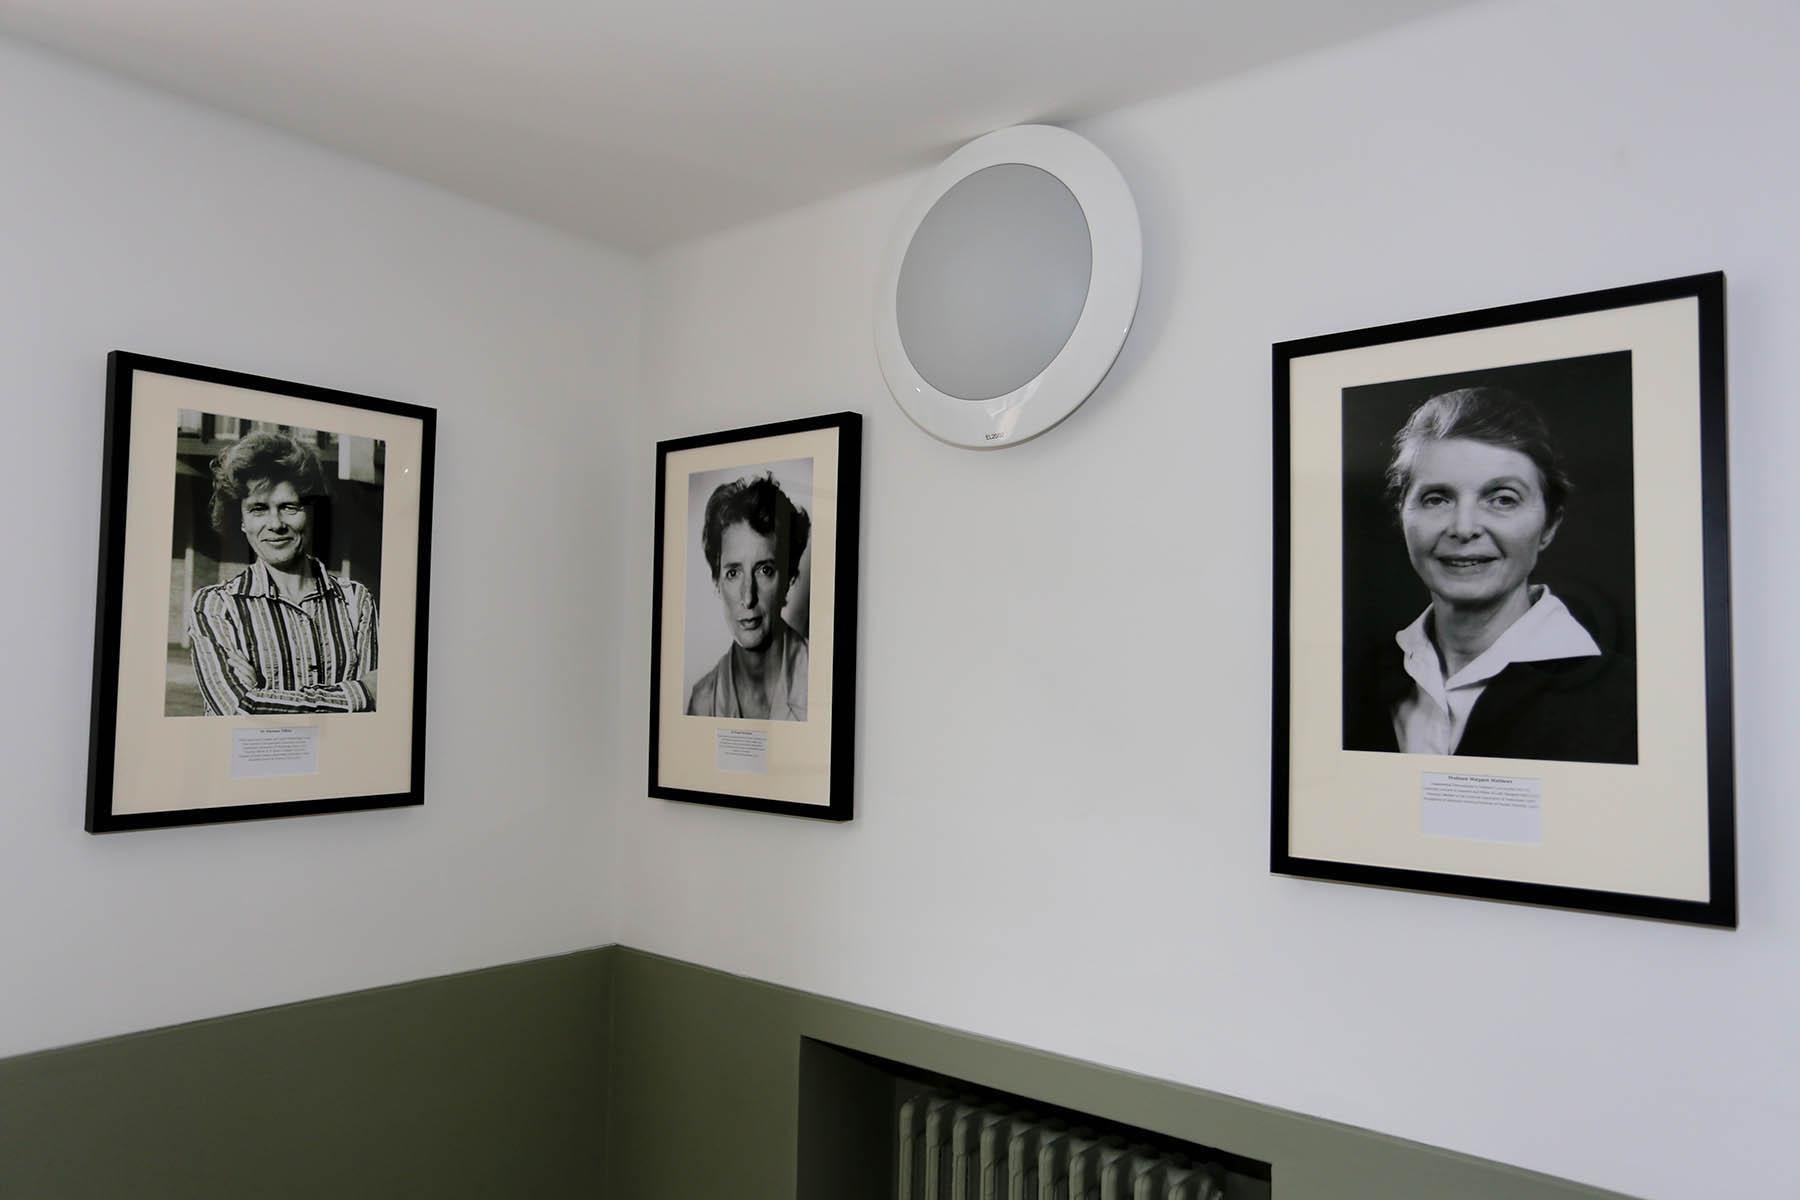 Marianne Fillenz, Pam MacKinnon and Margaret Matthews Sherrington display